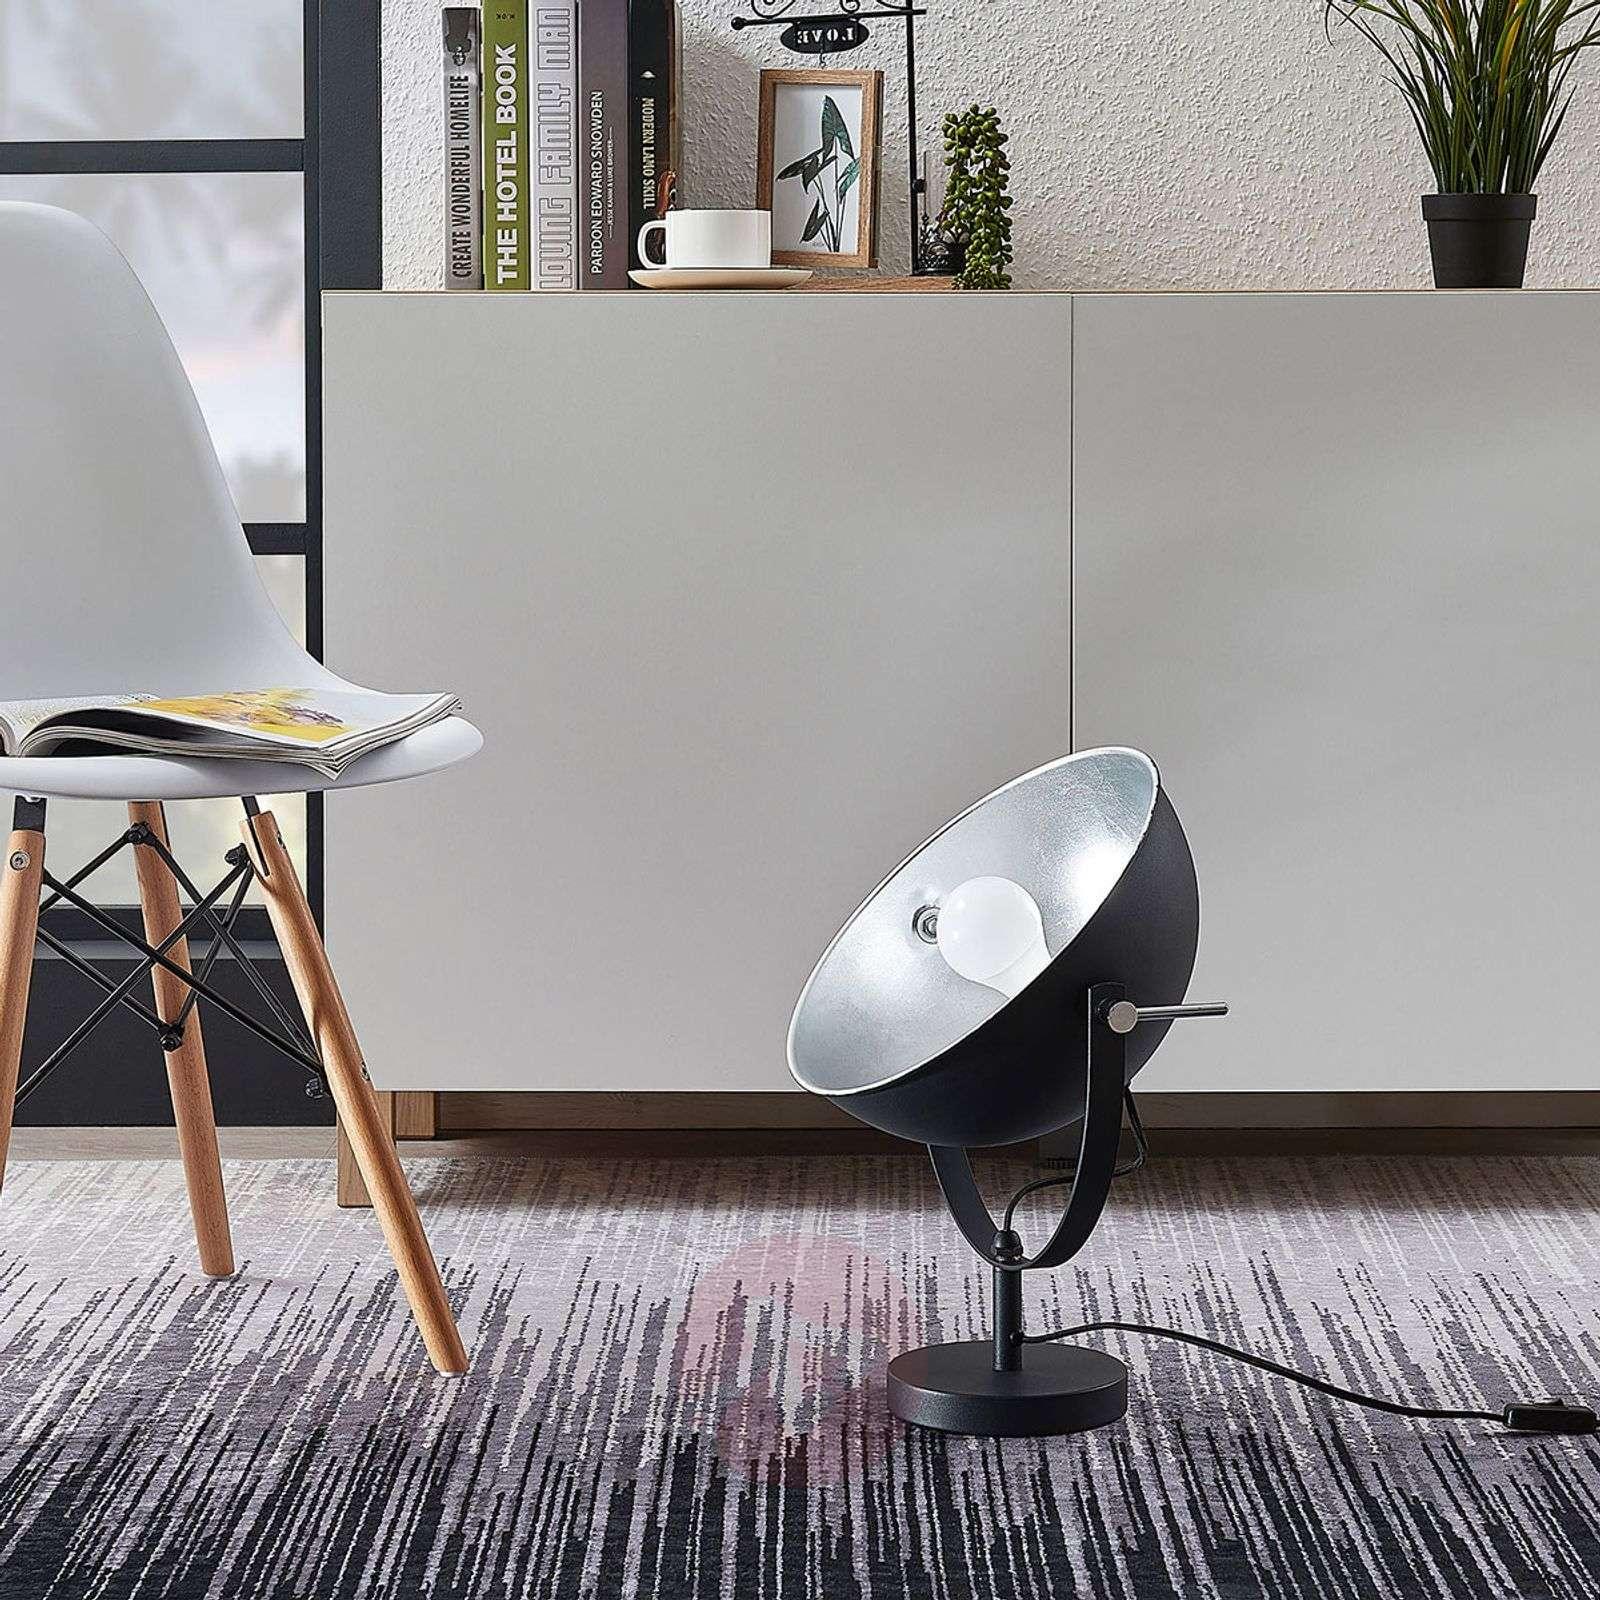 Lindby Smart LED-pöytävalaisin Muriel 44 cm, hopea-9624221-02